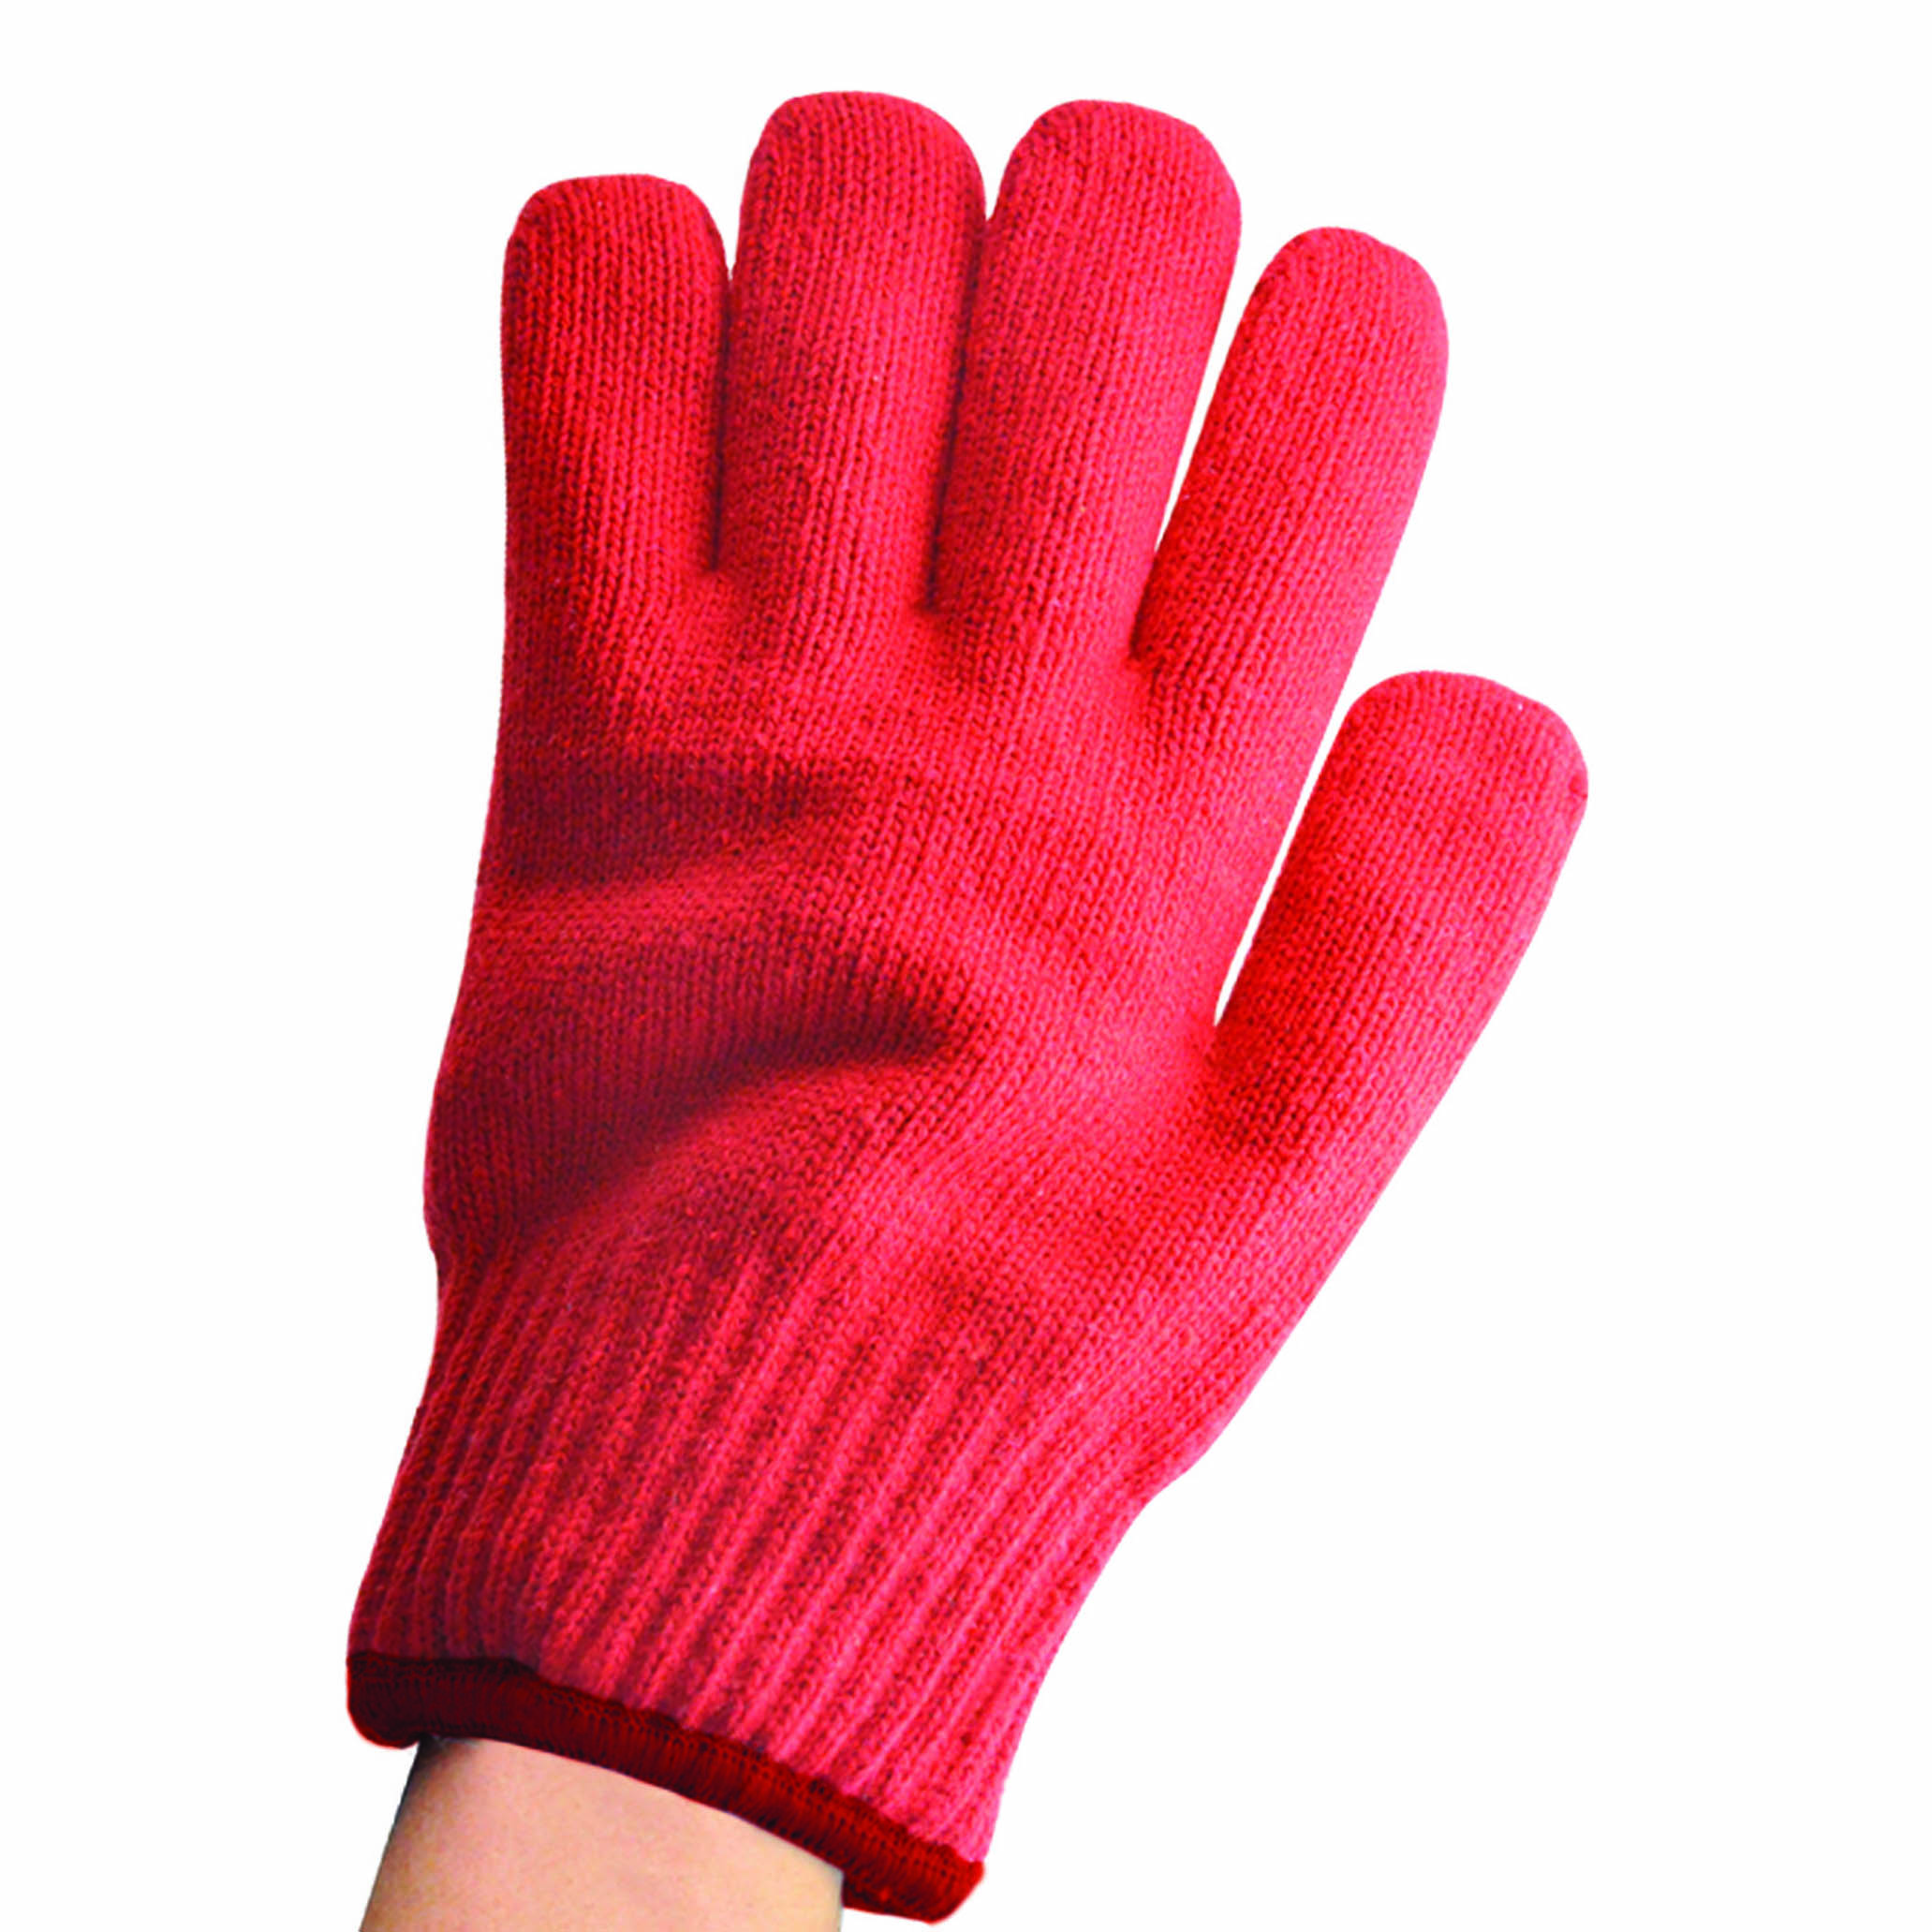 Tuff Glove EXTRA 3